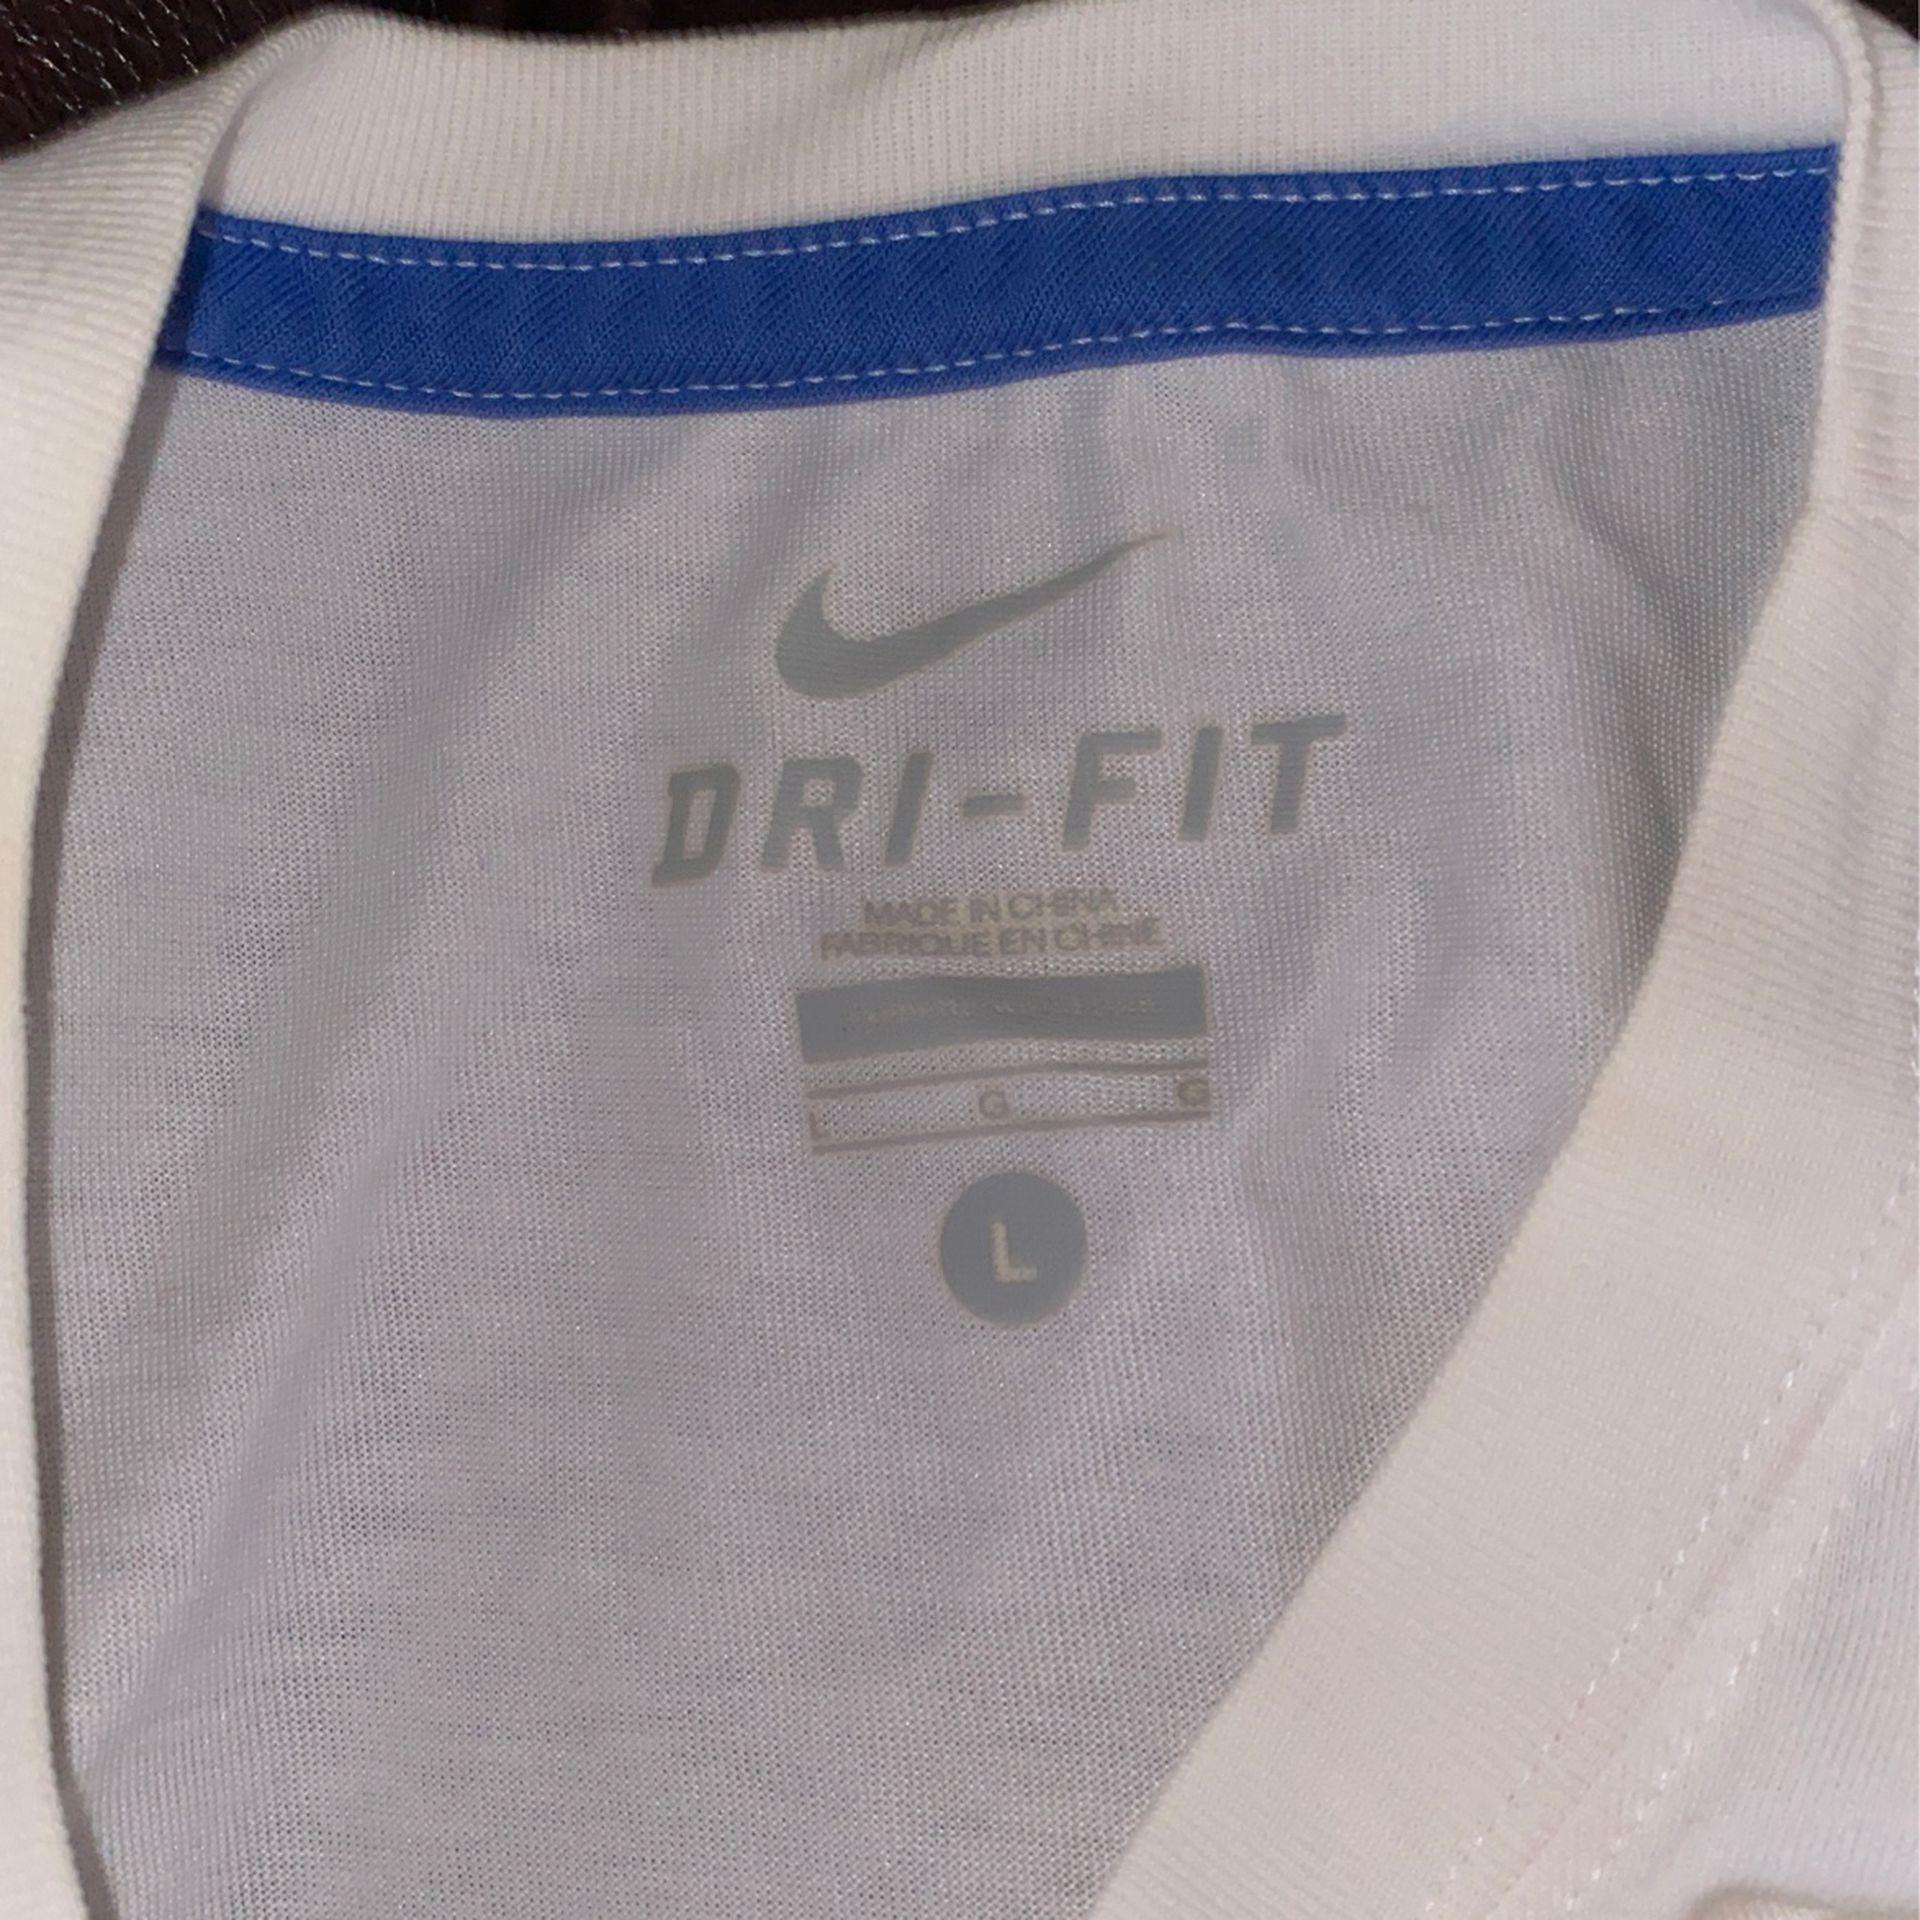 Nike dri-fit kobe graphic tee (white/blue)(L)